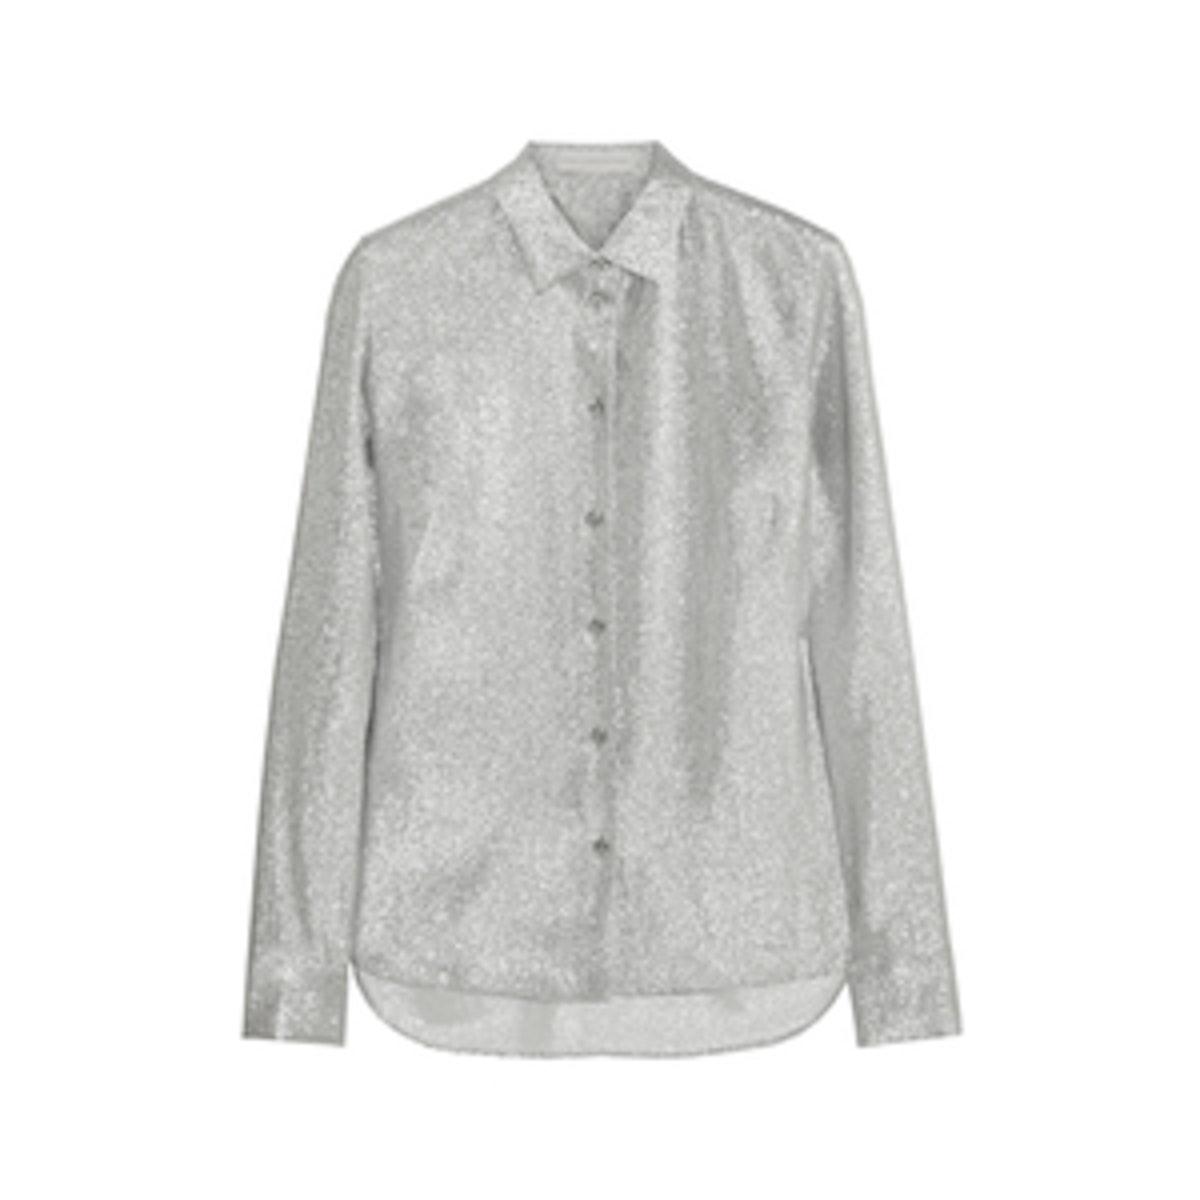 Wilson Lame Shirt